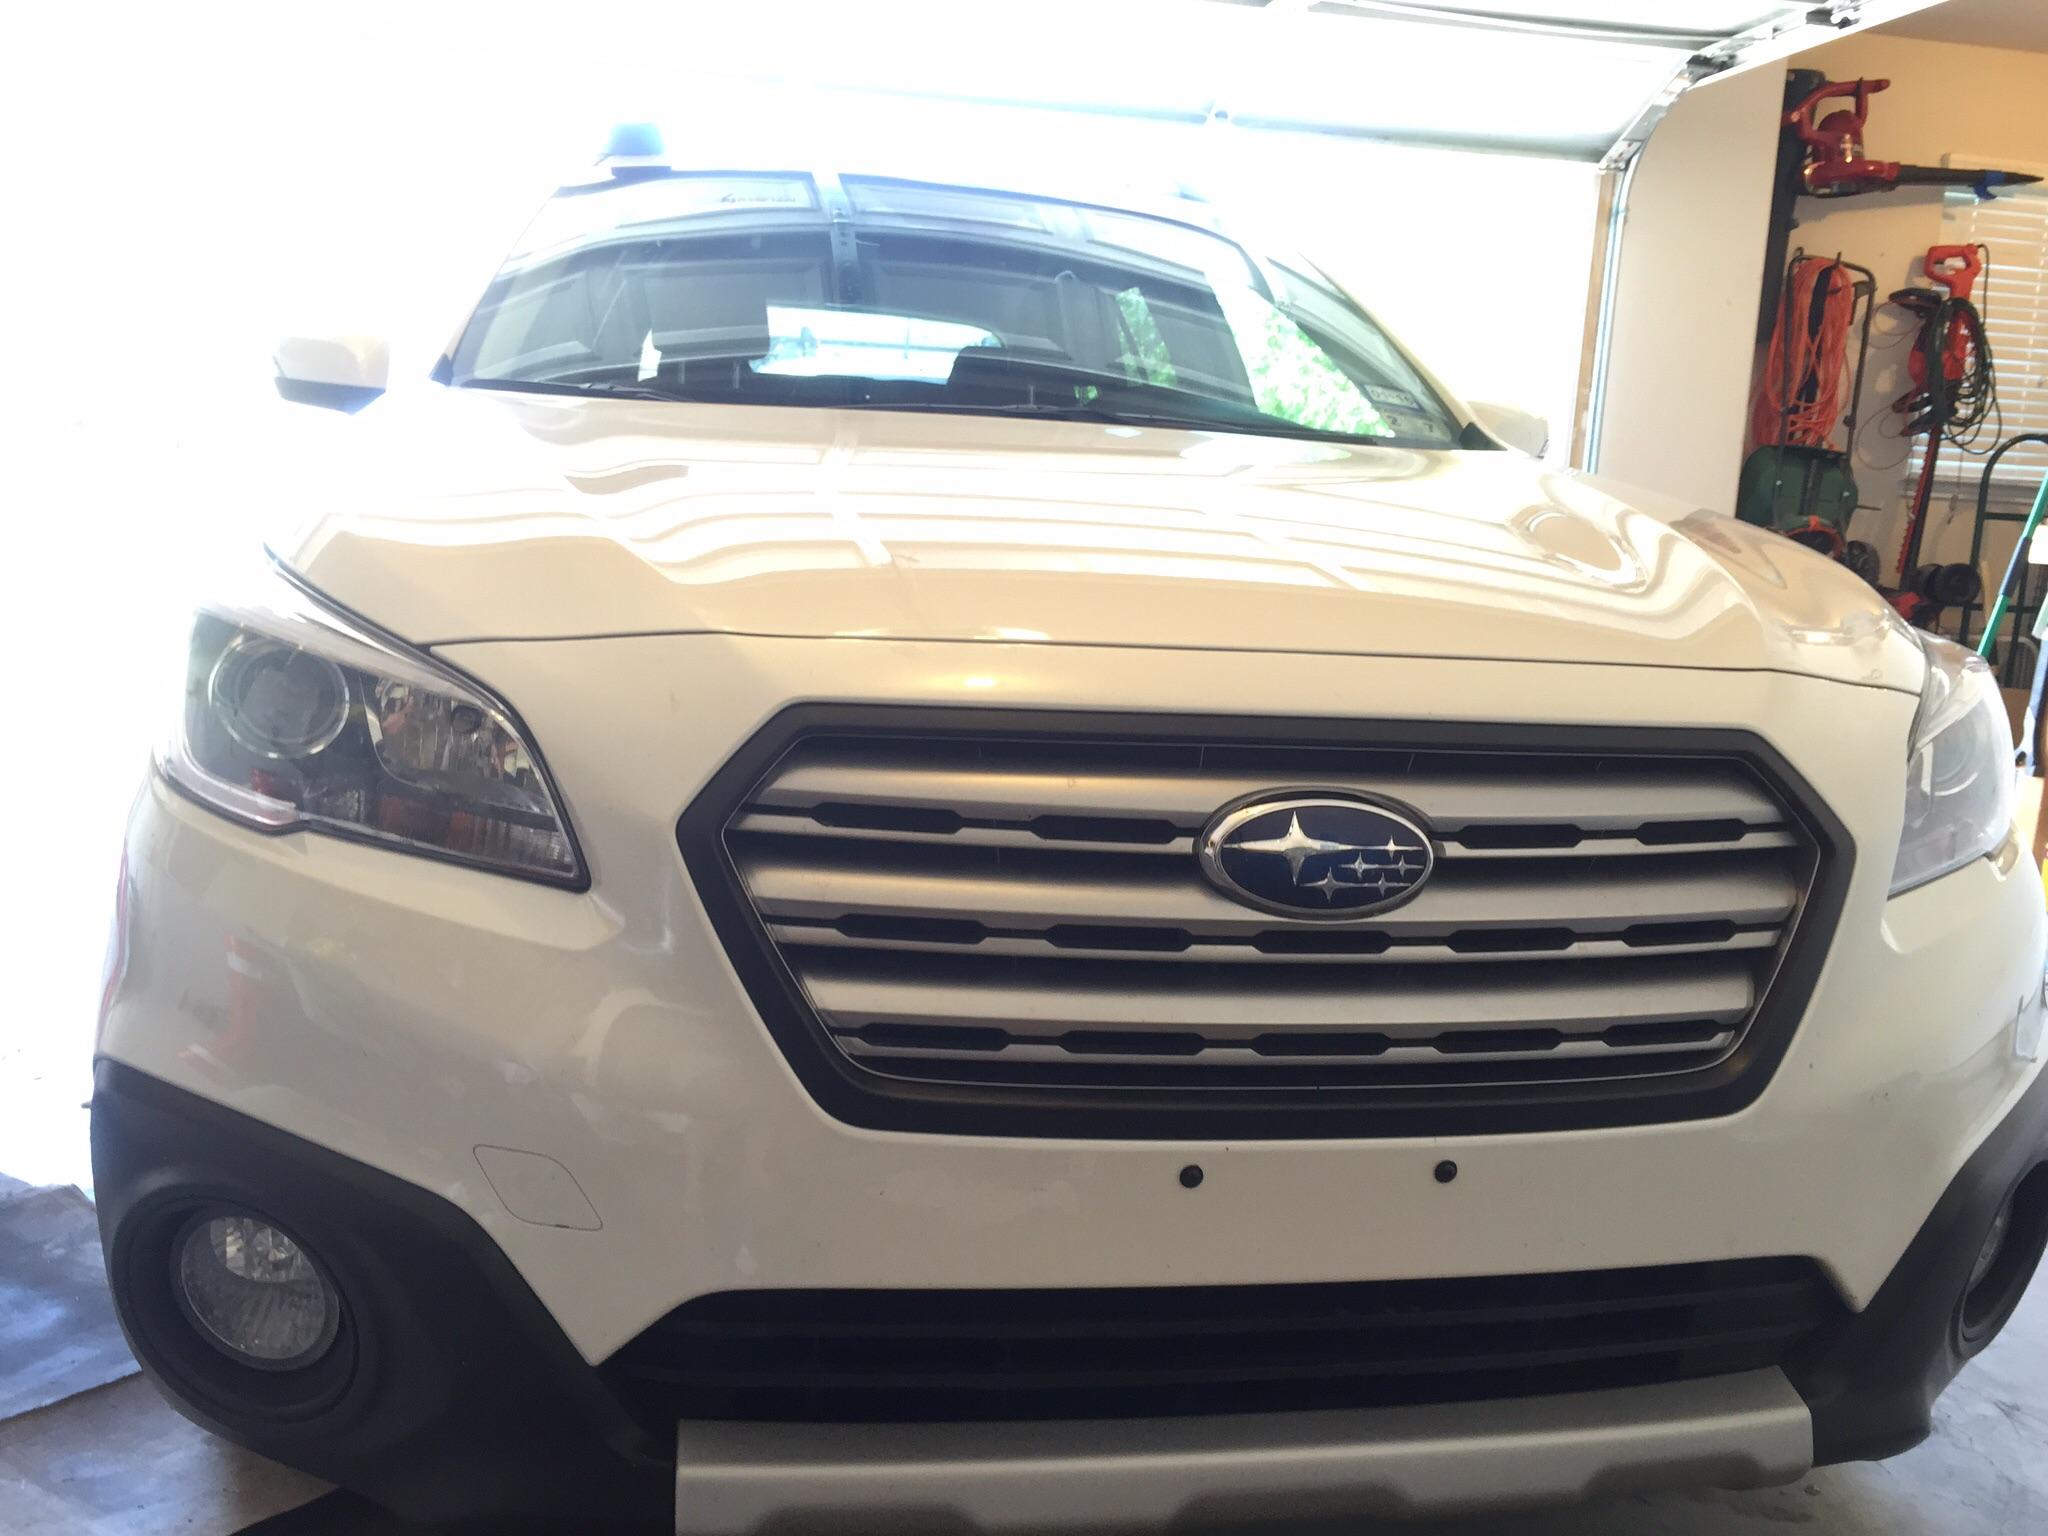 Plasti Dipped Chrome Pics Subaru Outback Subaru